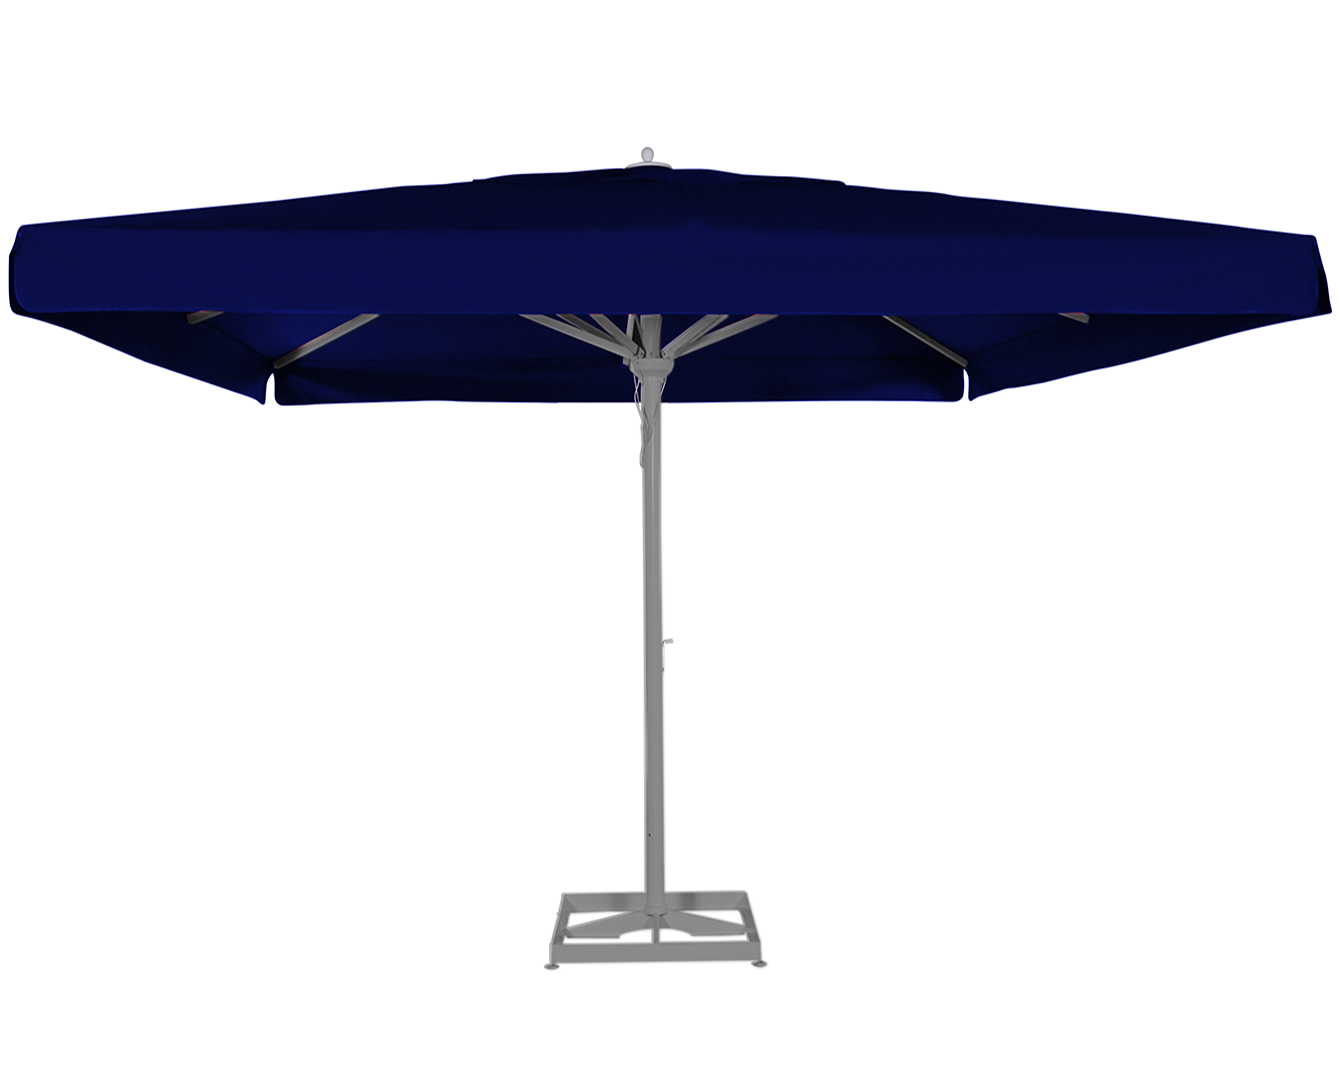 maestro prestige solero grand parasol mat central en alu 4x4m 3x4m terrasse restaurant. Black Bedroom Furniture Sets. Home Design Ideas